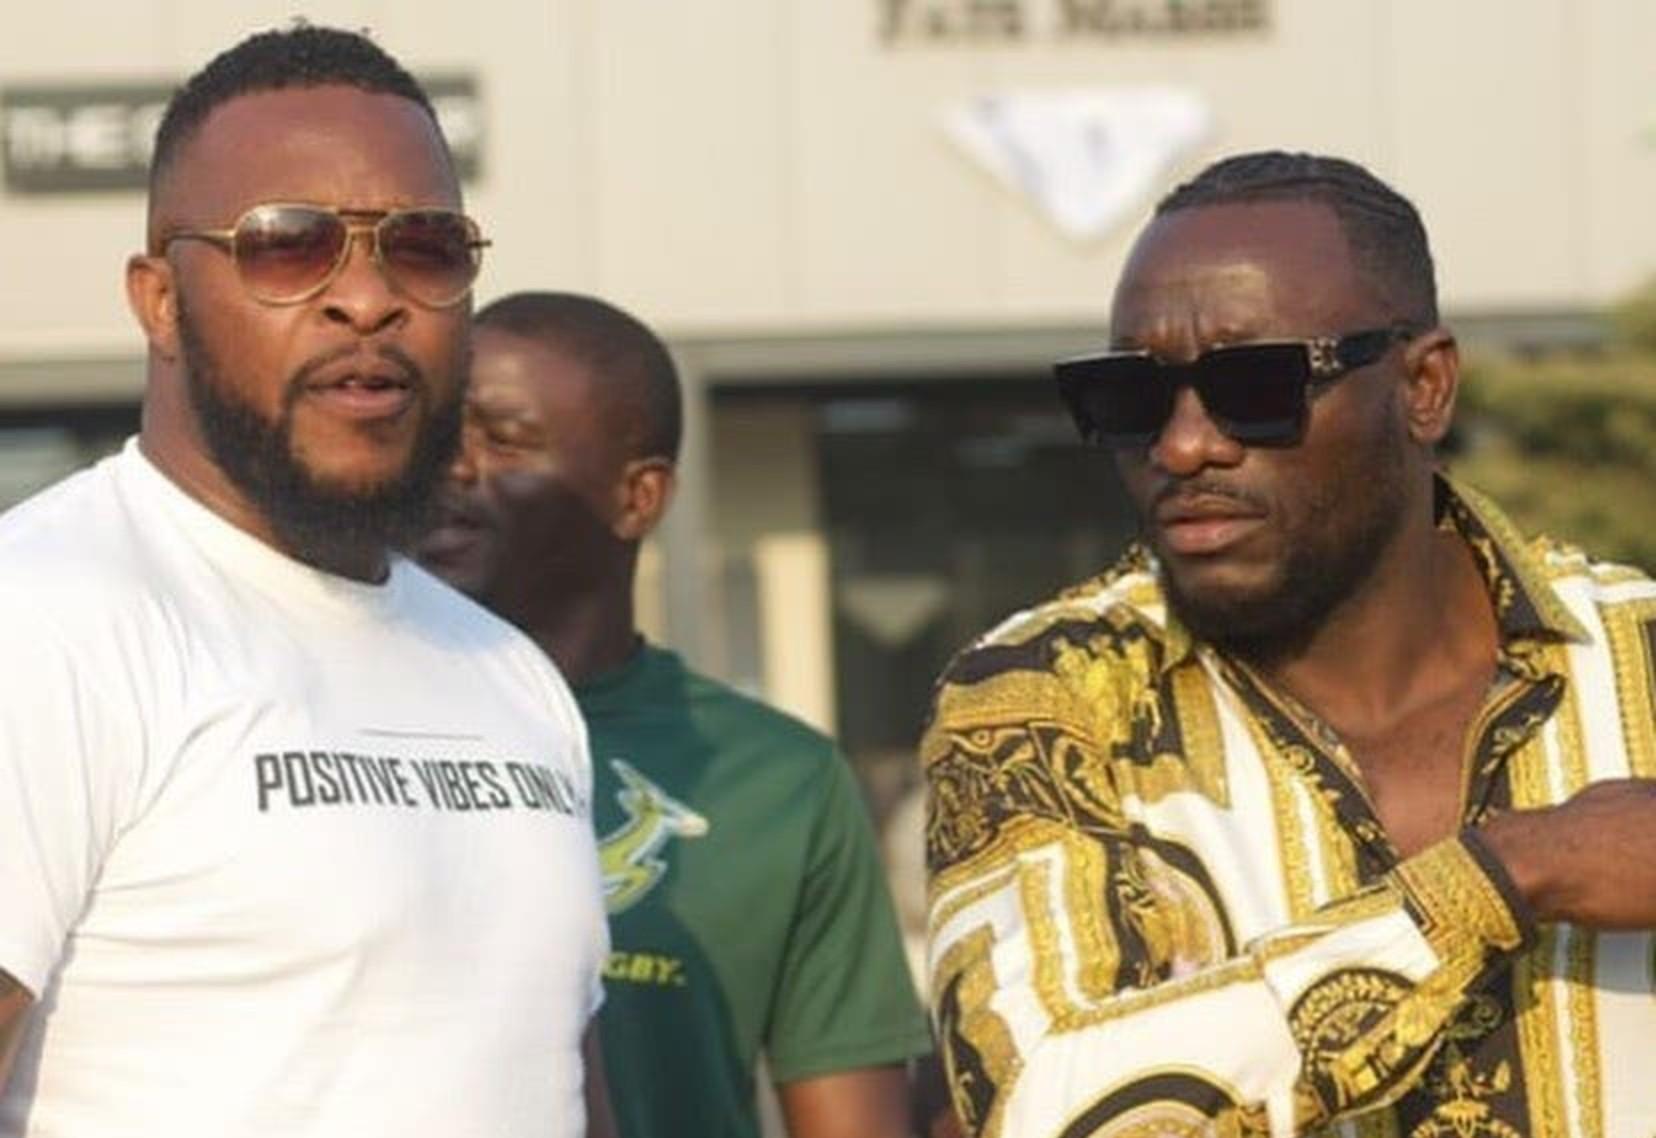 Genius Ginimbi Kadungure Was Killed By His Boyfriend Dj Rimo - Tatelicious Karigambe-Sandberg